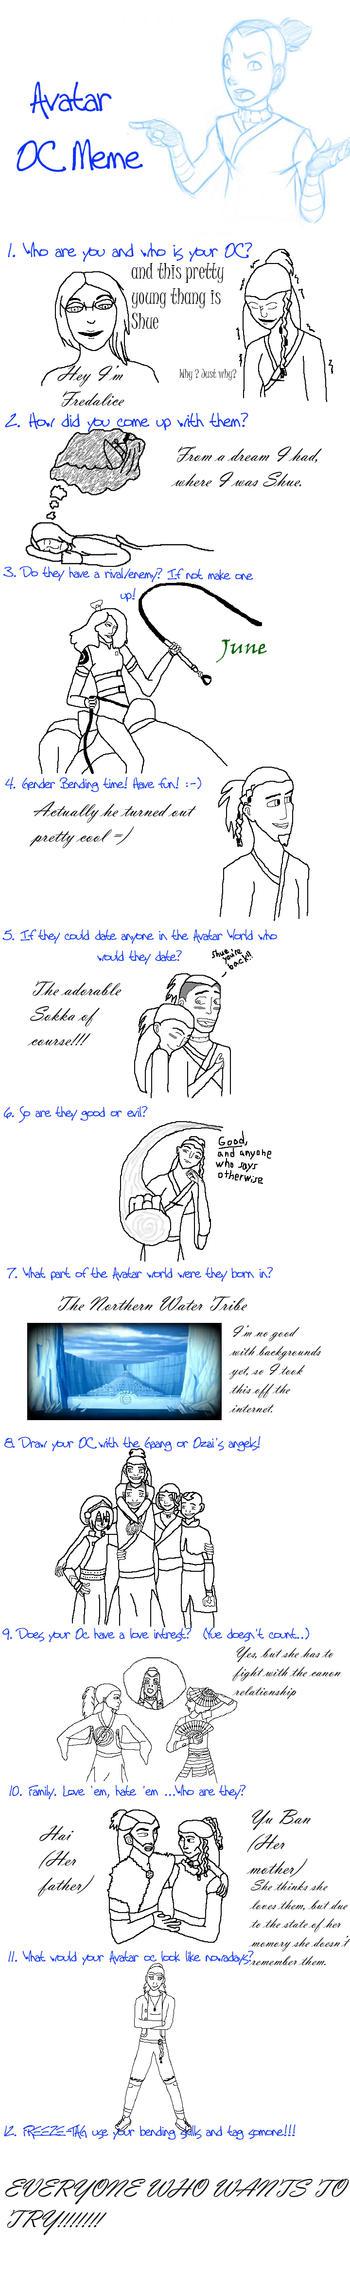 Avatar OC meme (Shue) by Fredalice